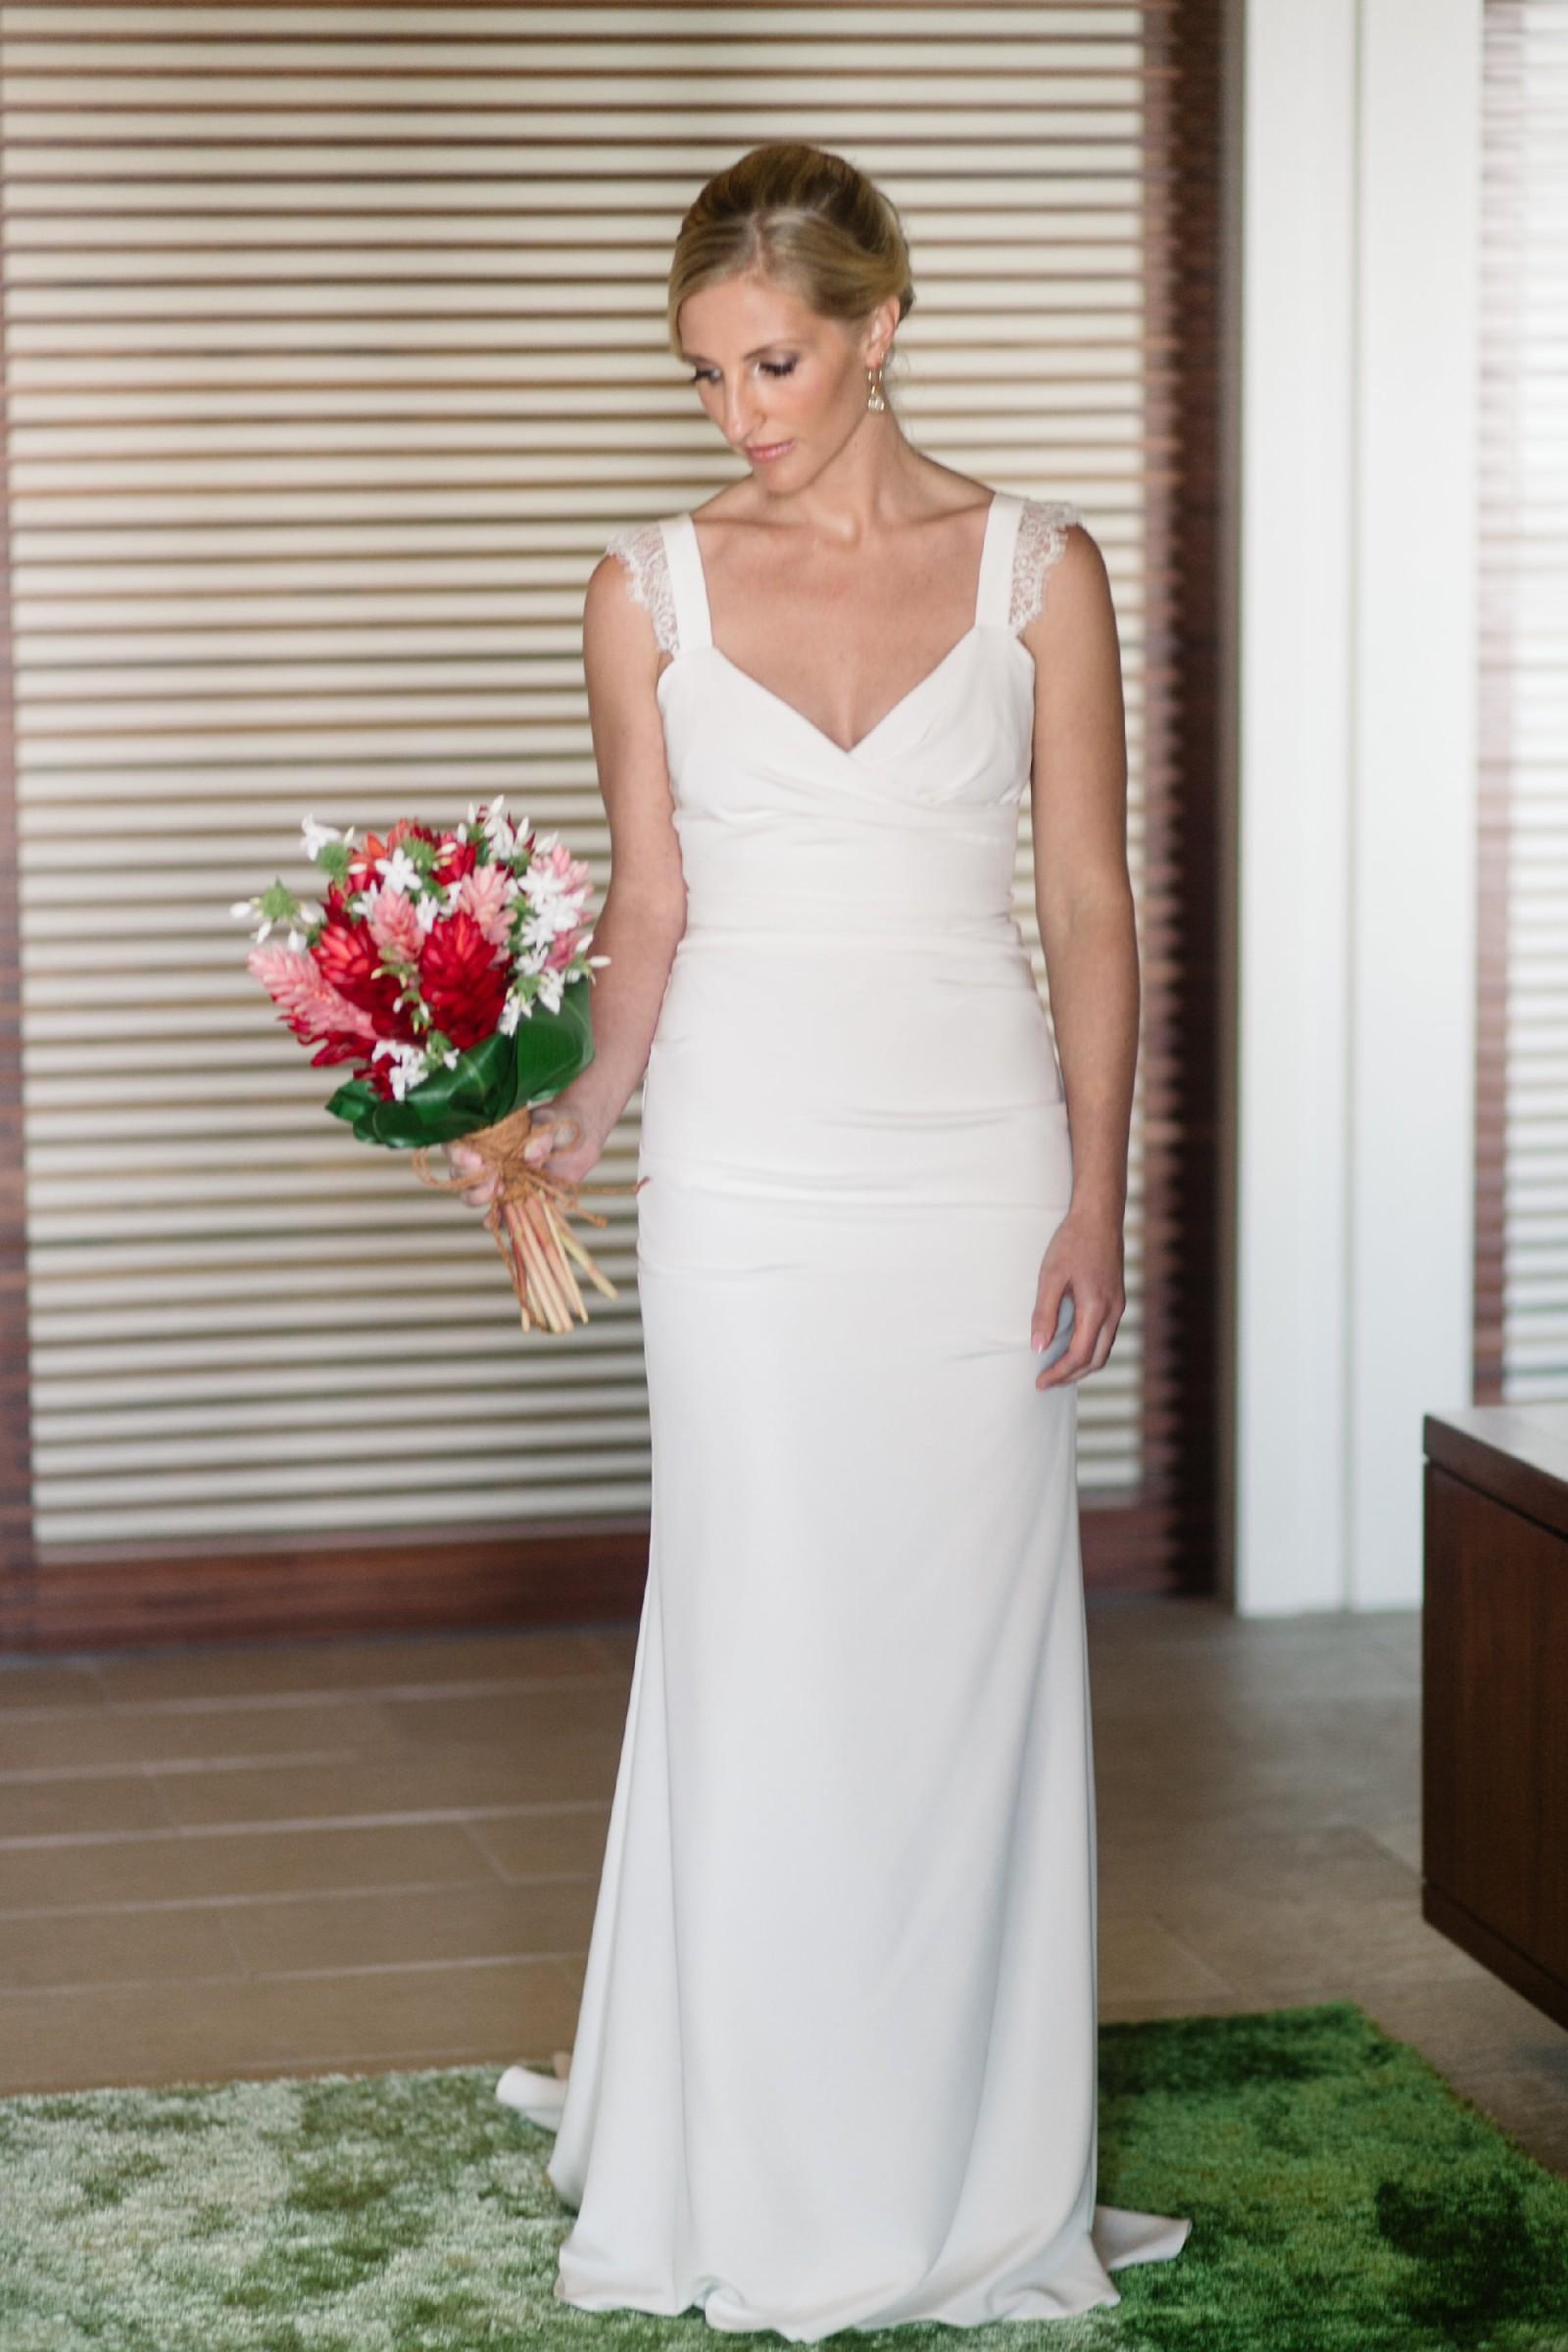 Nicole Miller Alexis Wedding Dress On Sale 50 Off